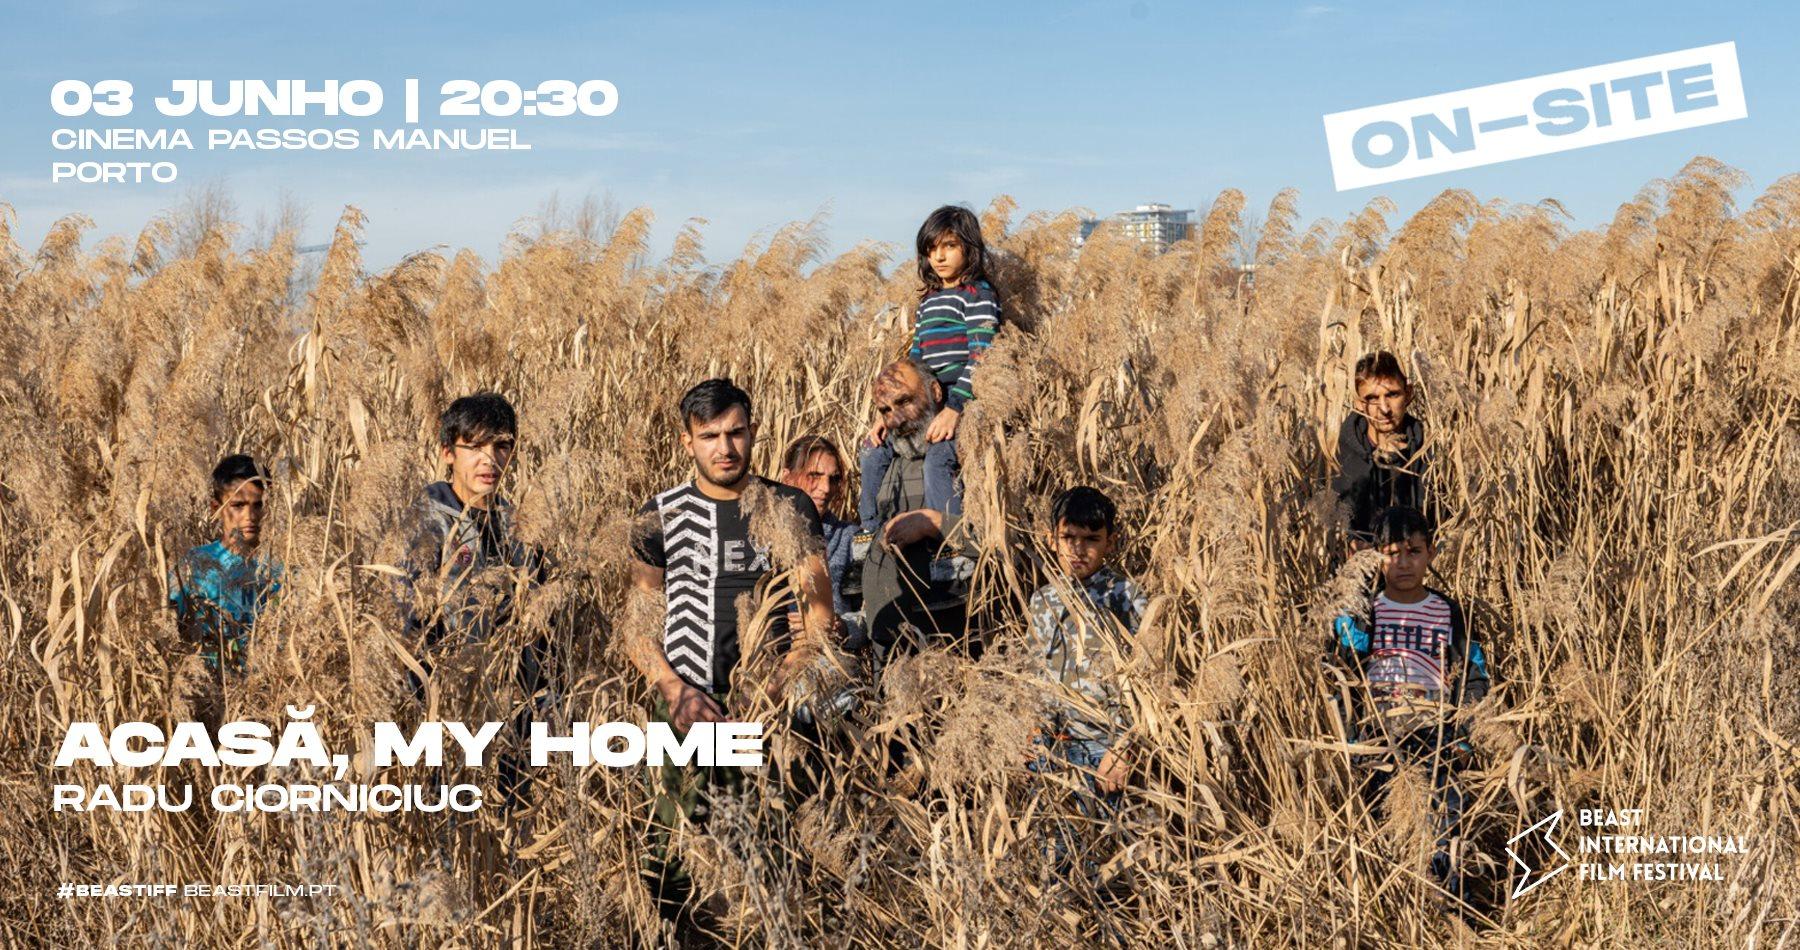 BEAST IFF ON-SITE #12 | Acasă, My Home